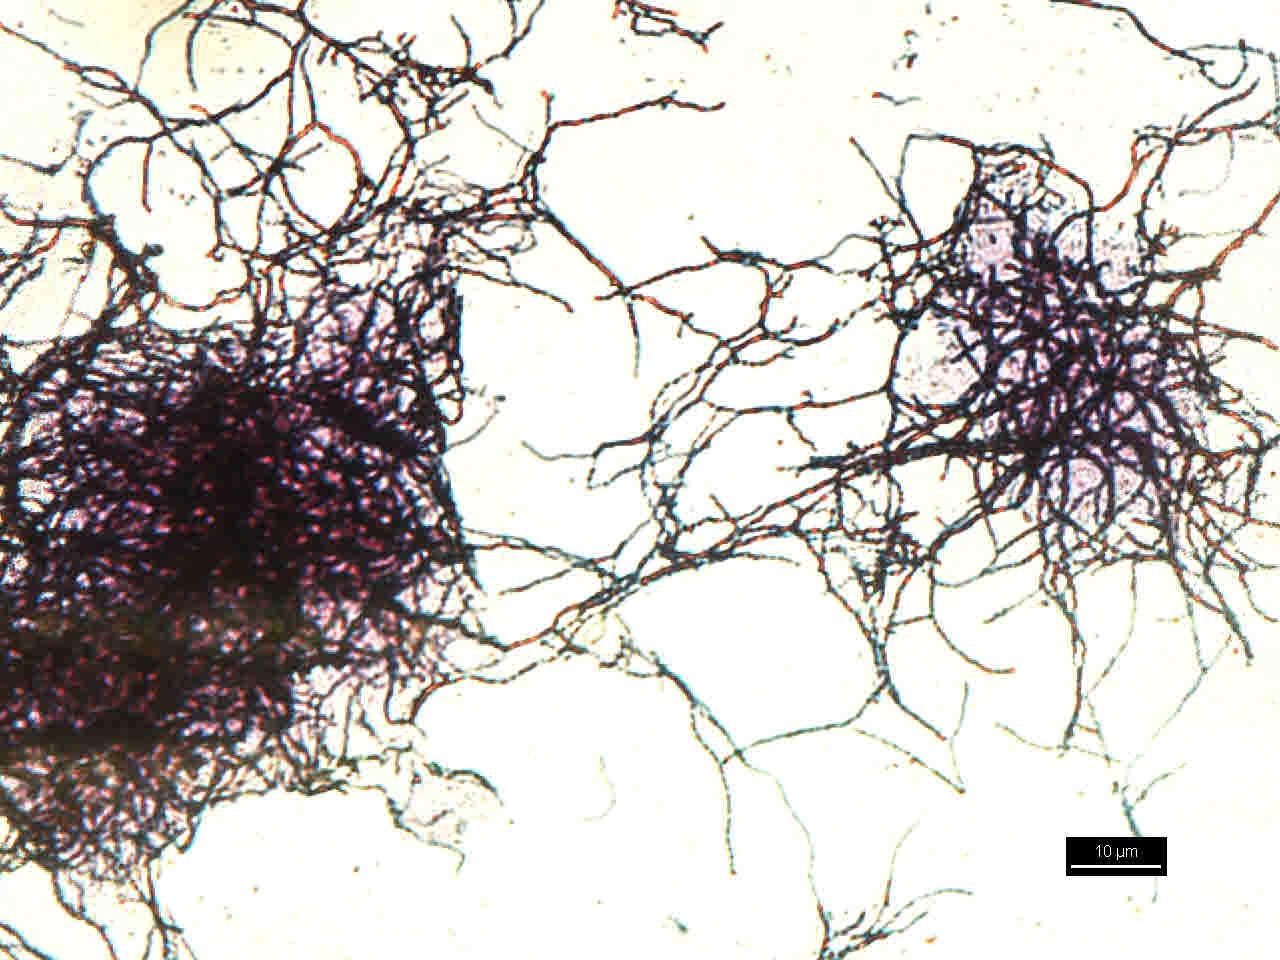 Actinomyces. Photo credits to Nurul